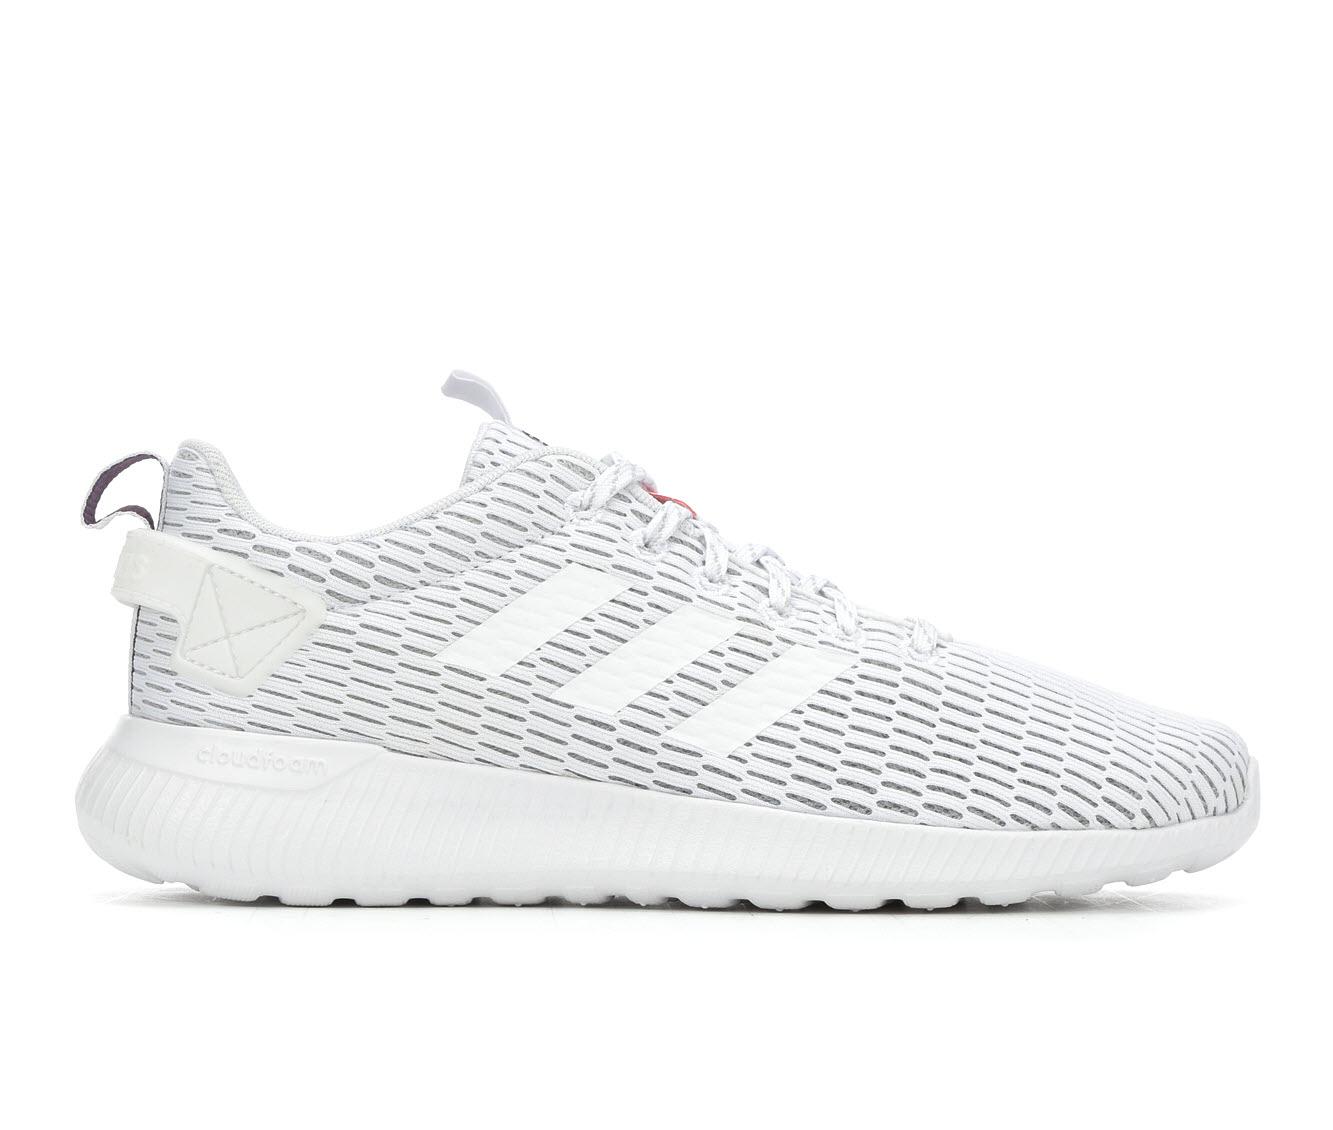 Adidas Lite Racer Climacool Women's Athletic Shoe (White)